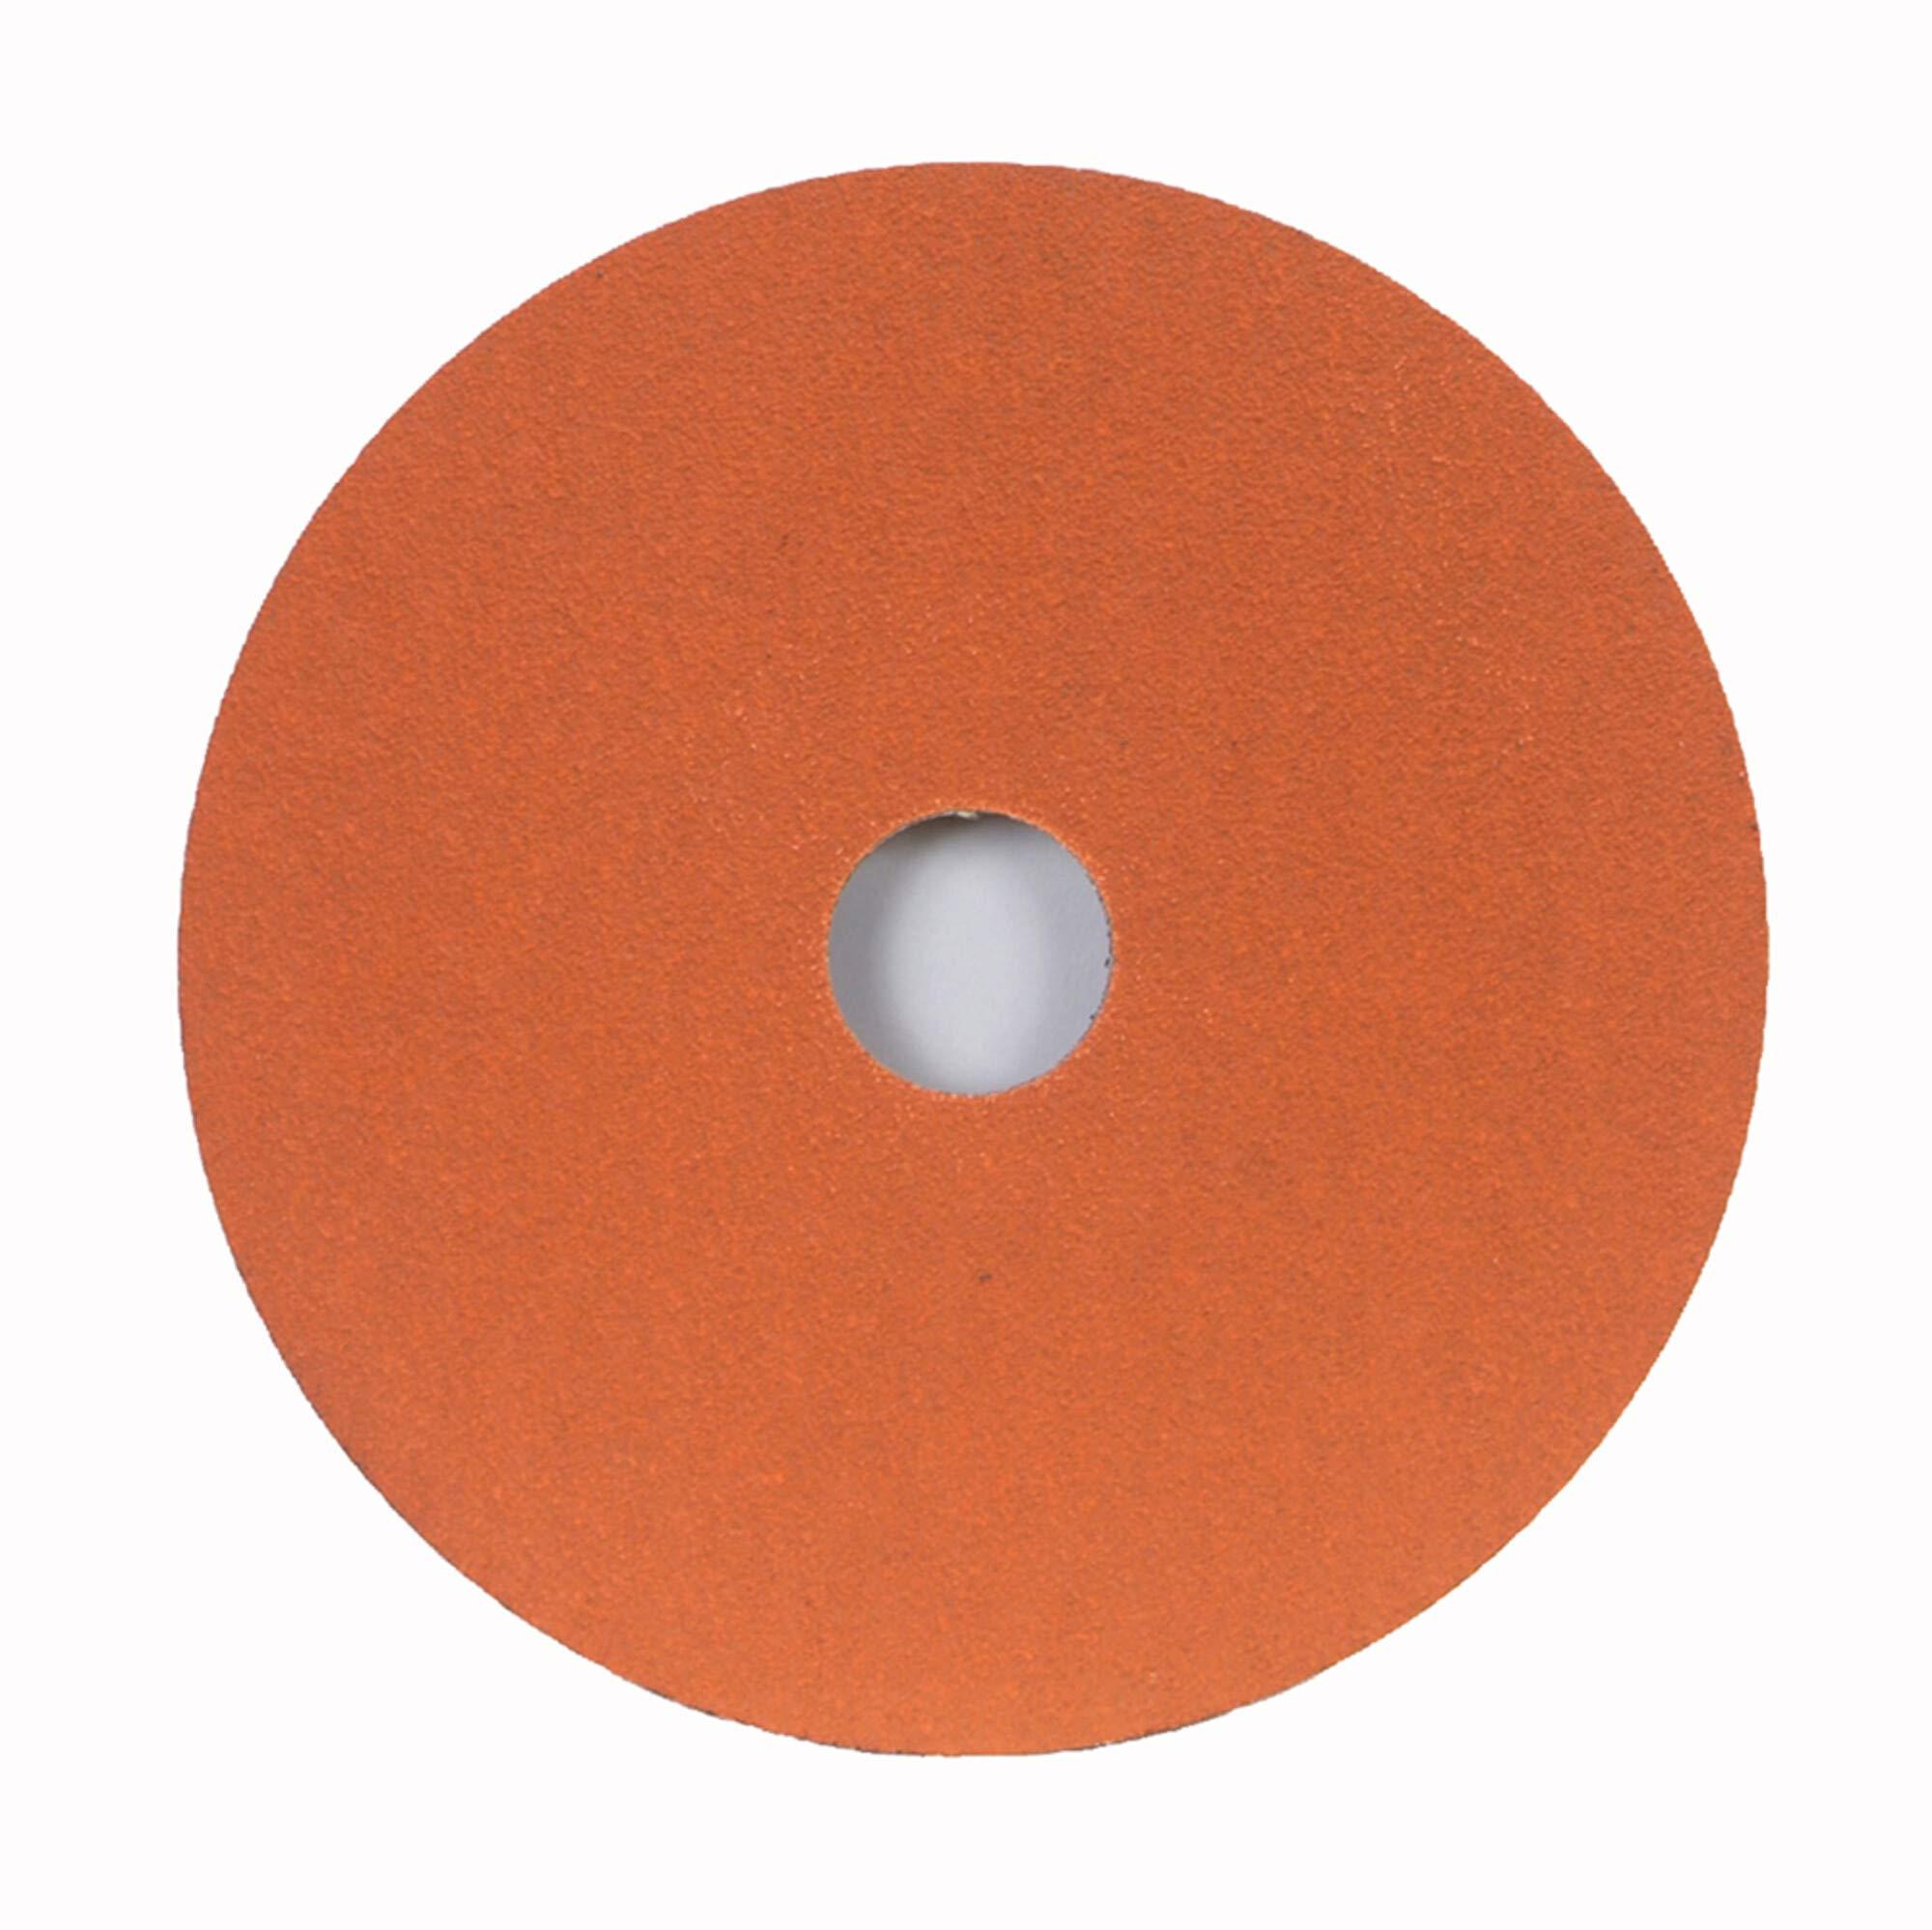 Norton SG Blaze F980 Abrasive Disc, Fiber Backing, Ceramic Aluminum Oxide, 7/8'' Arbor, 5'' Diameter, Grit 80 (Box of 25)